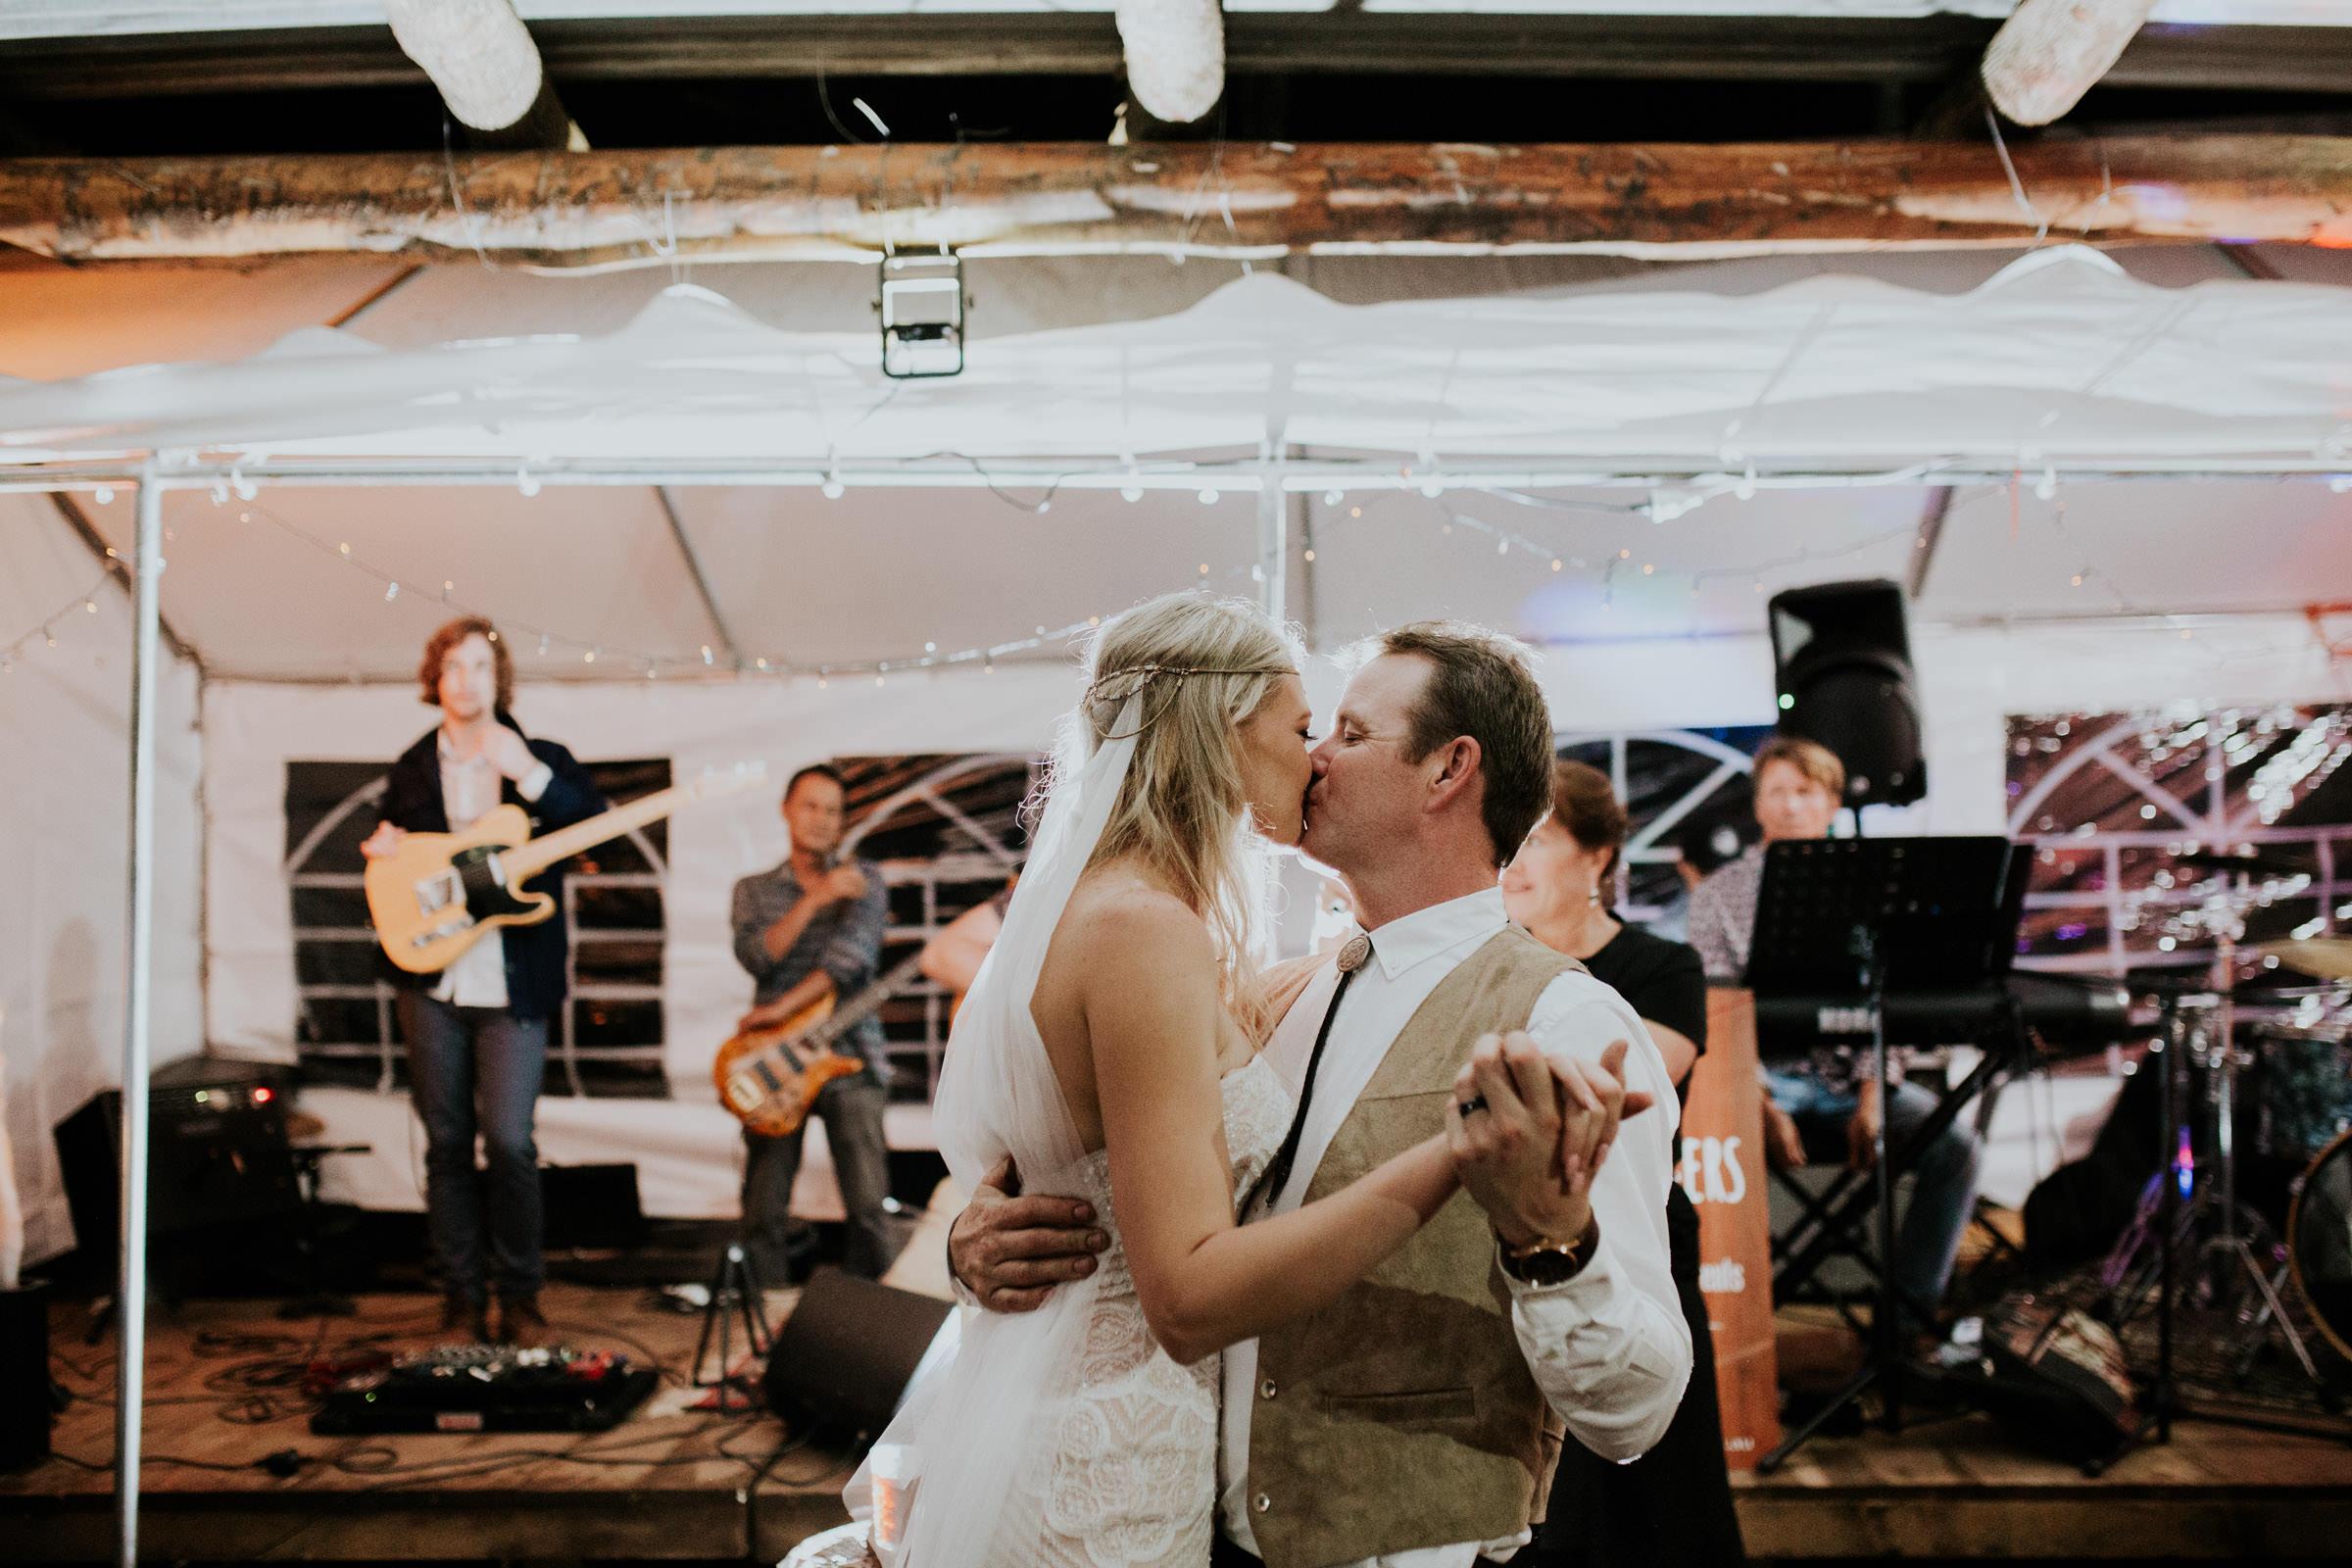 Emma+John+Far+South+Coast+Wedding+Festivl+Glamping+Bush-161.jpg